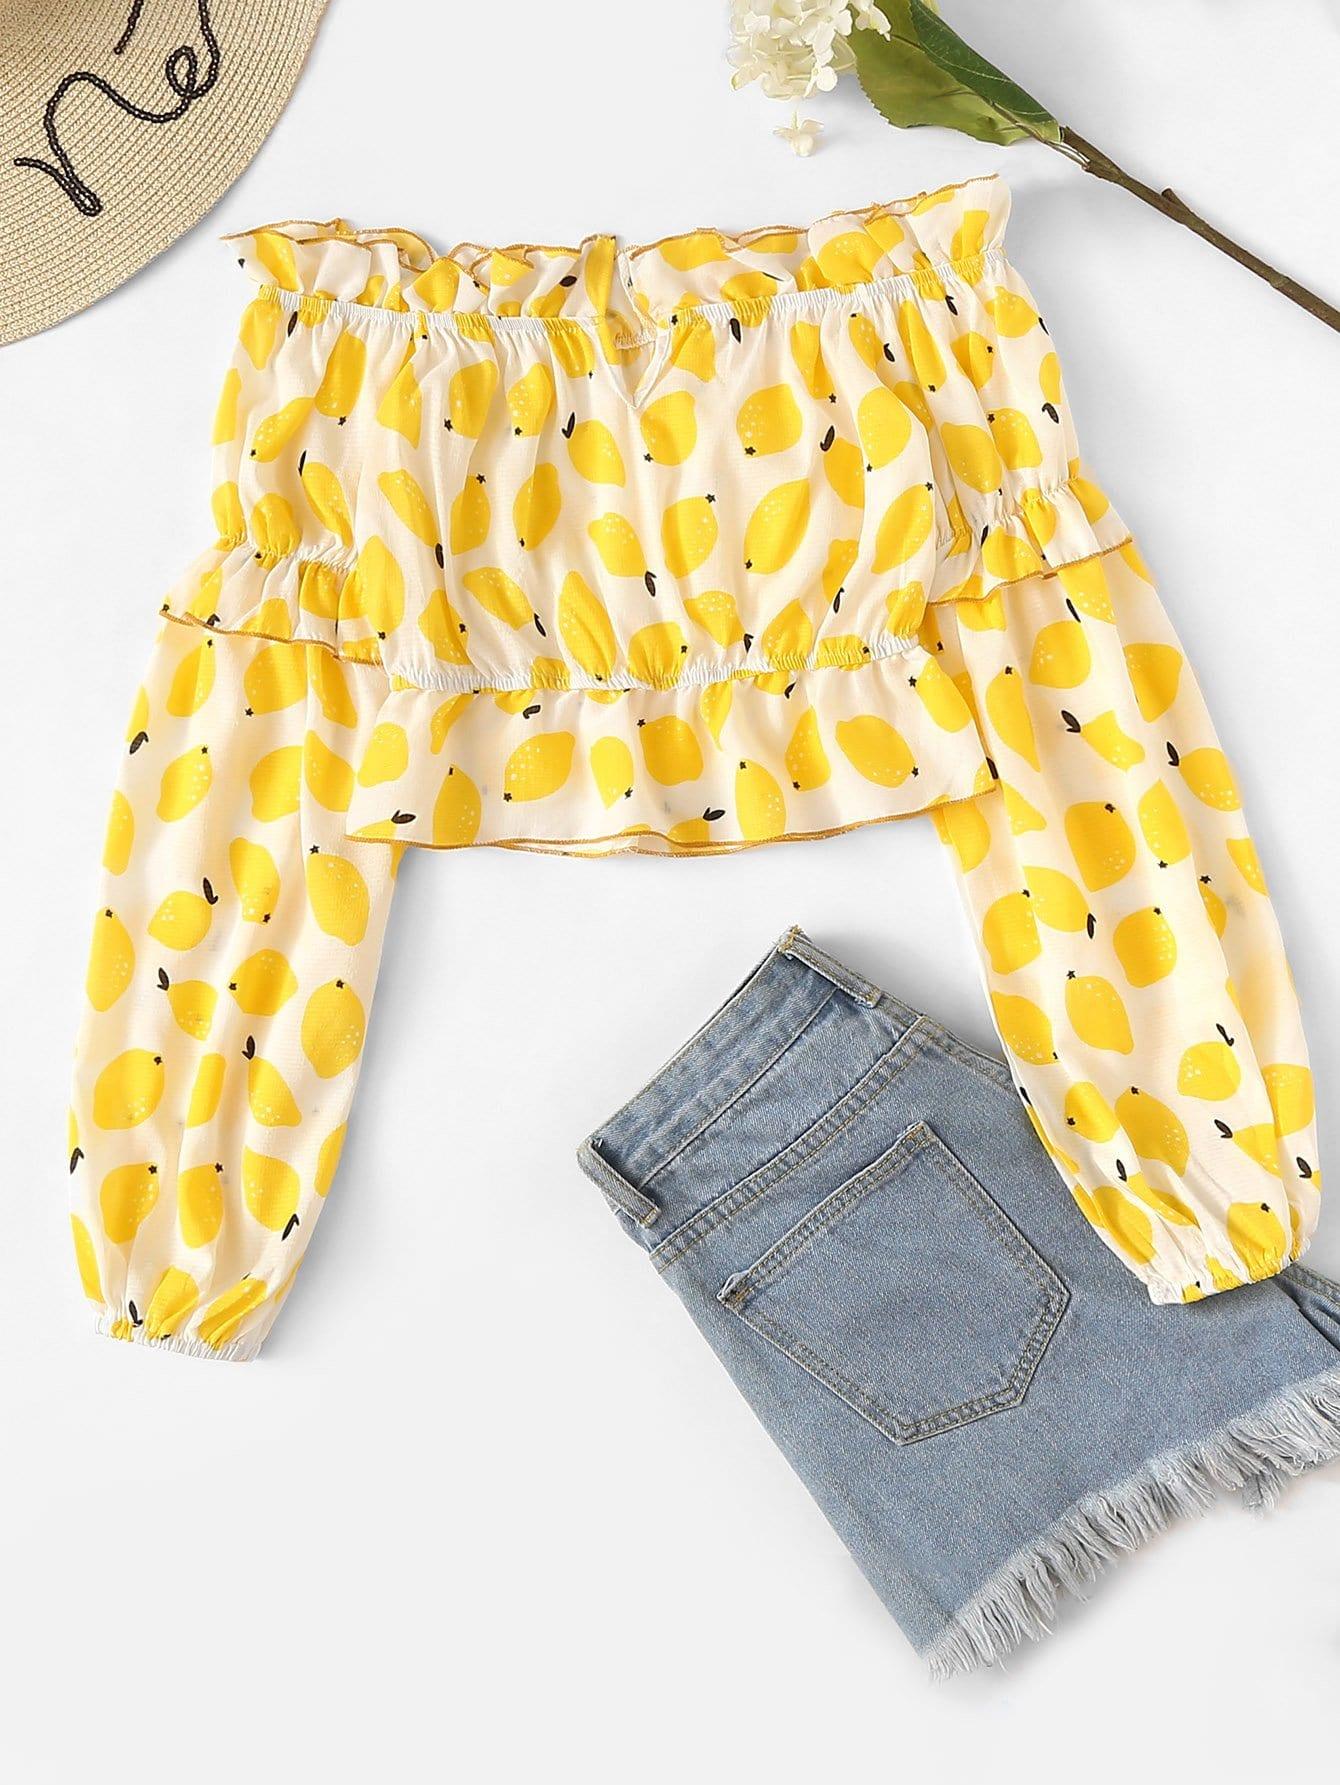 Fruit Print Ruffle Trim Frill Blouse ruffle trim floral print blouse